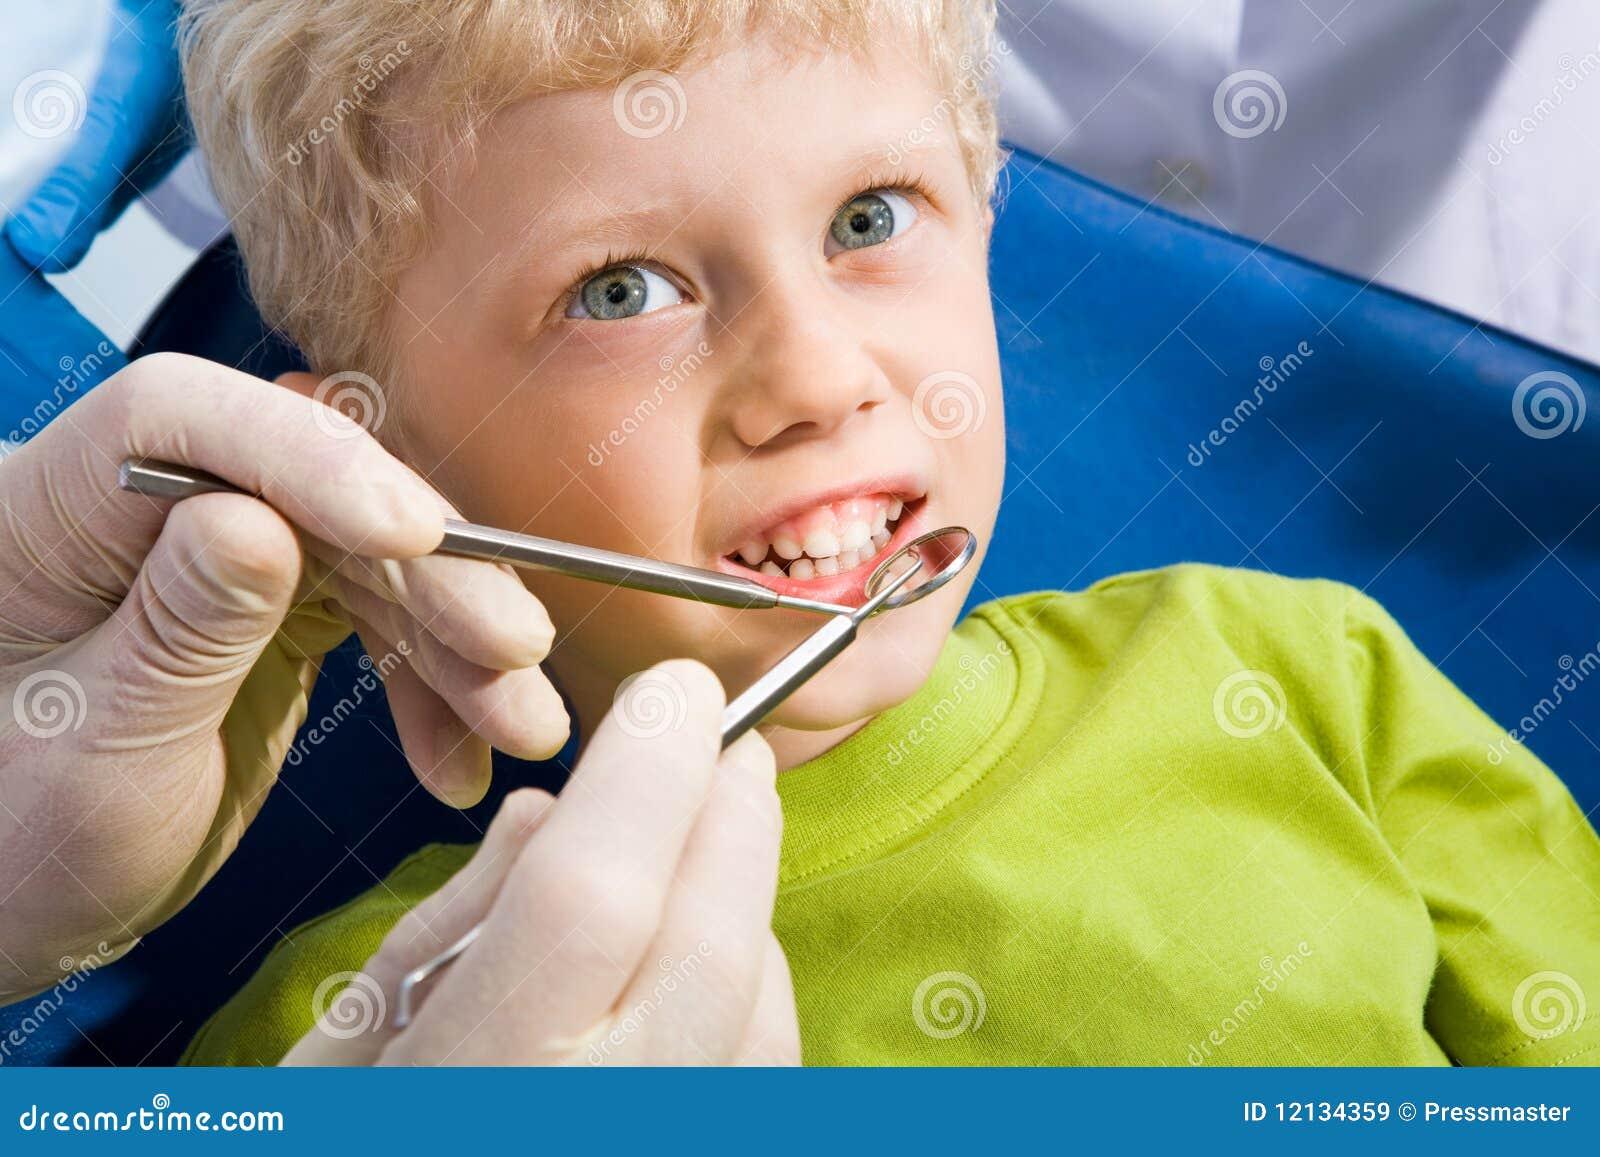 dental-treatment-12134359.jpg